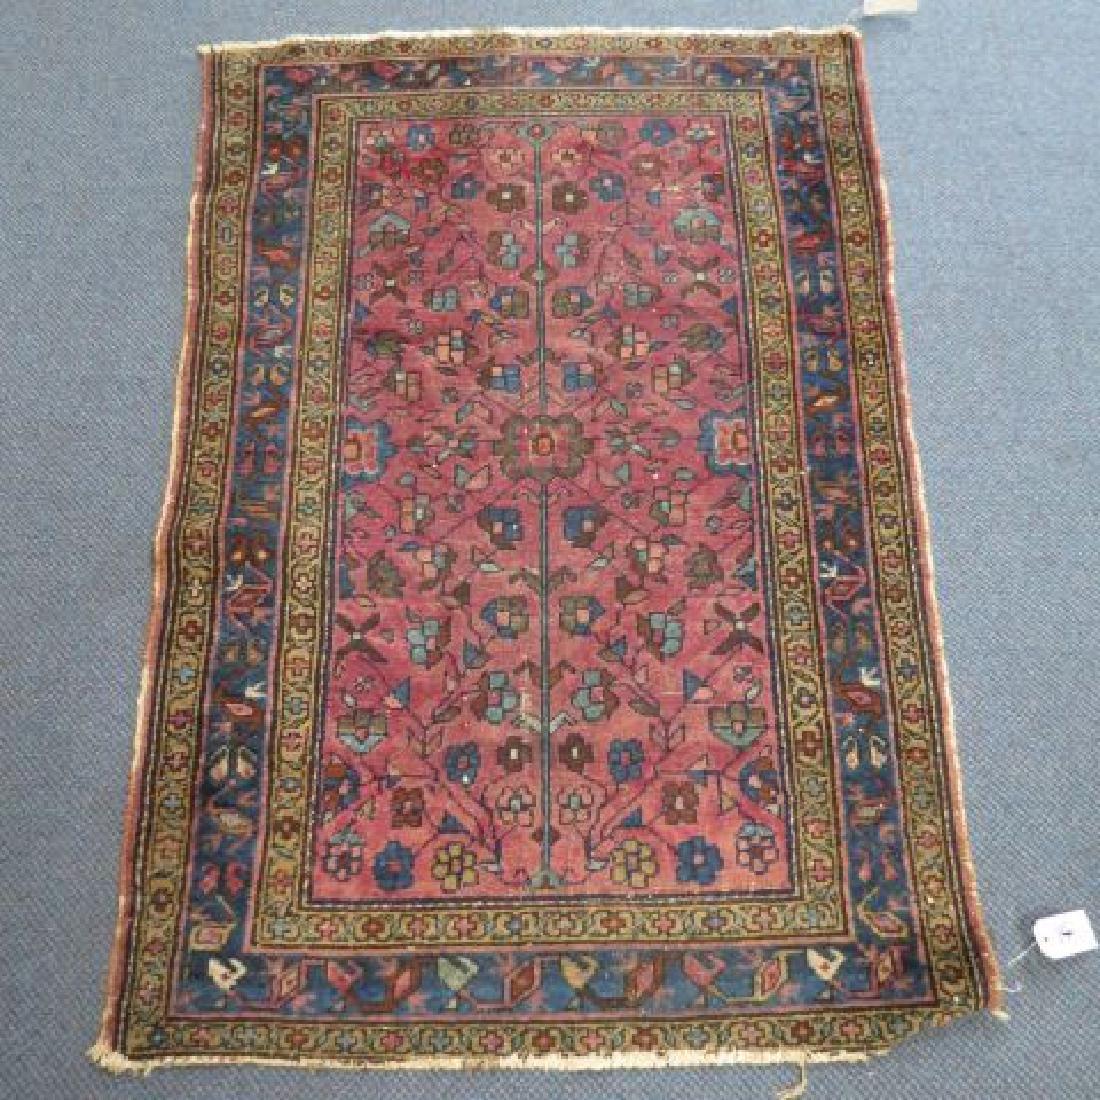 Antique Persian Handmade Rug,